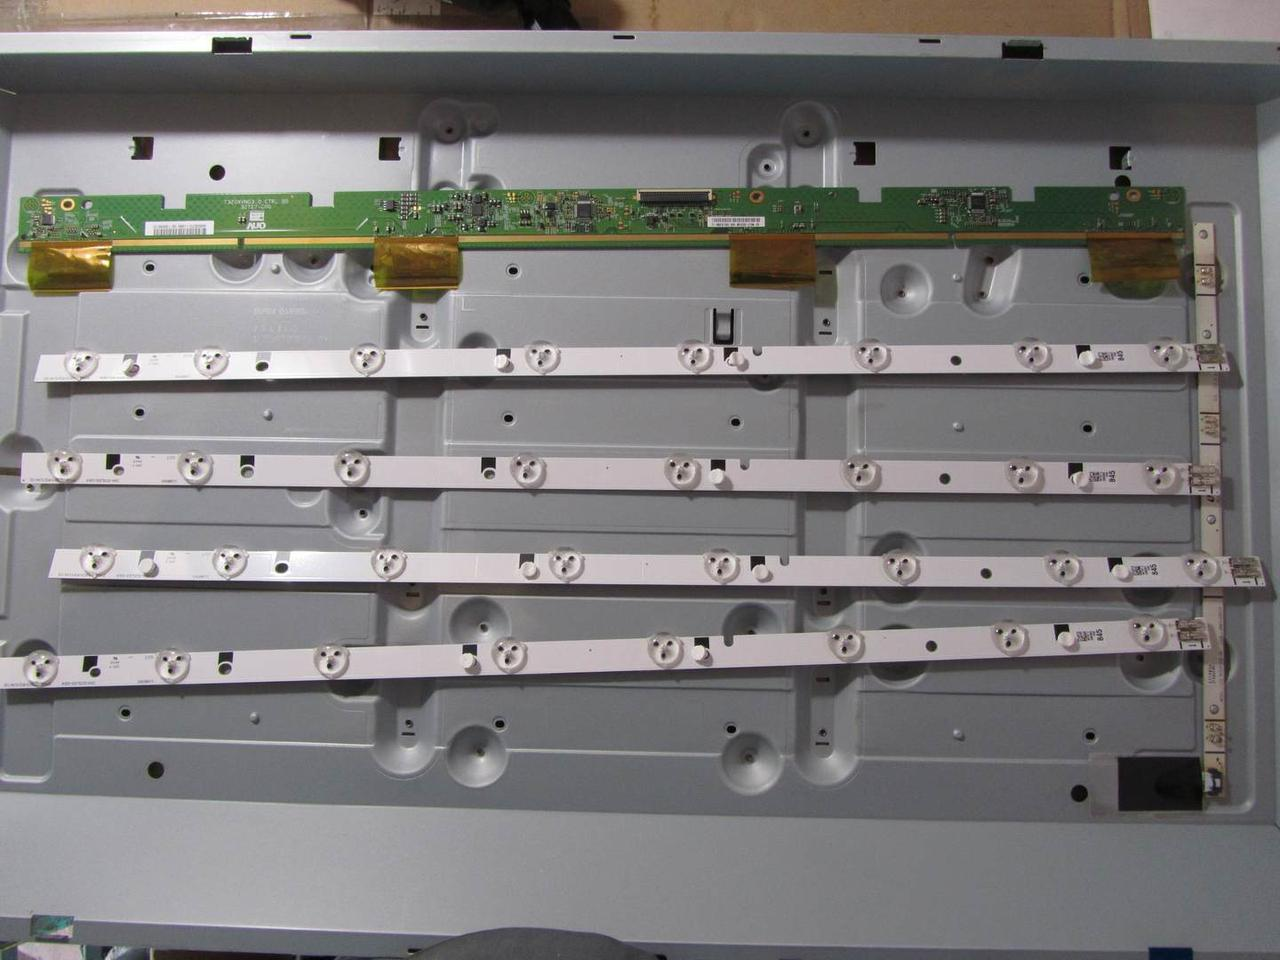 Светодиодная подсветка 32H-3535LED-32EA, D1GE-320SC0-R3 для телевизора Samsung UE32EH4030W